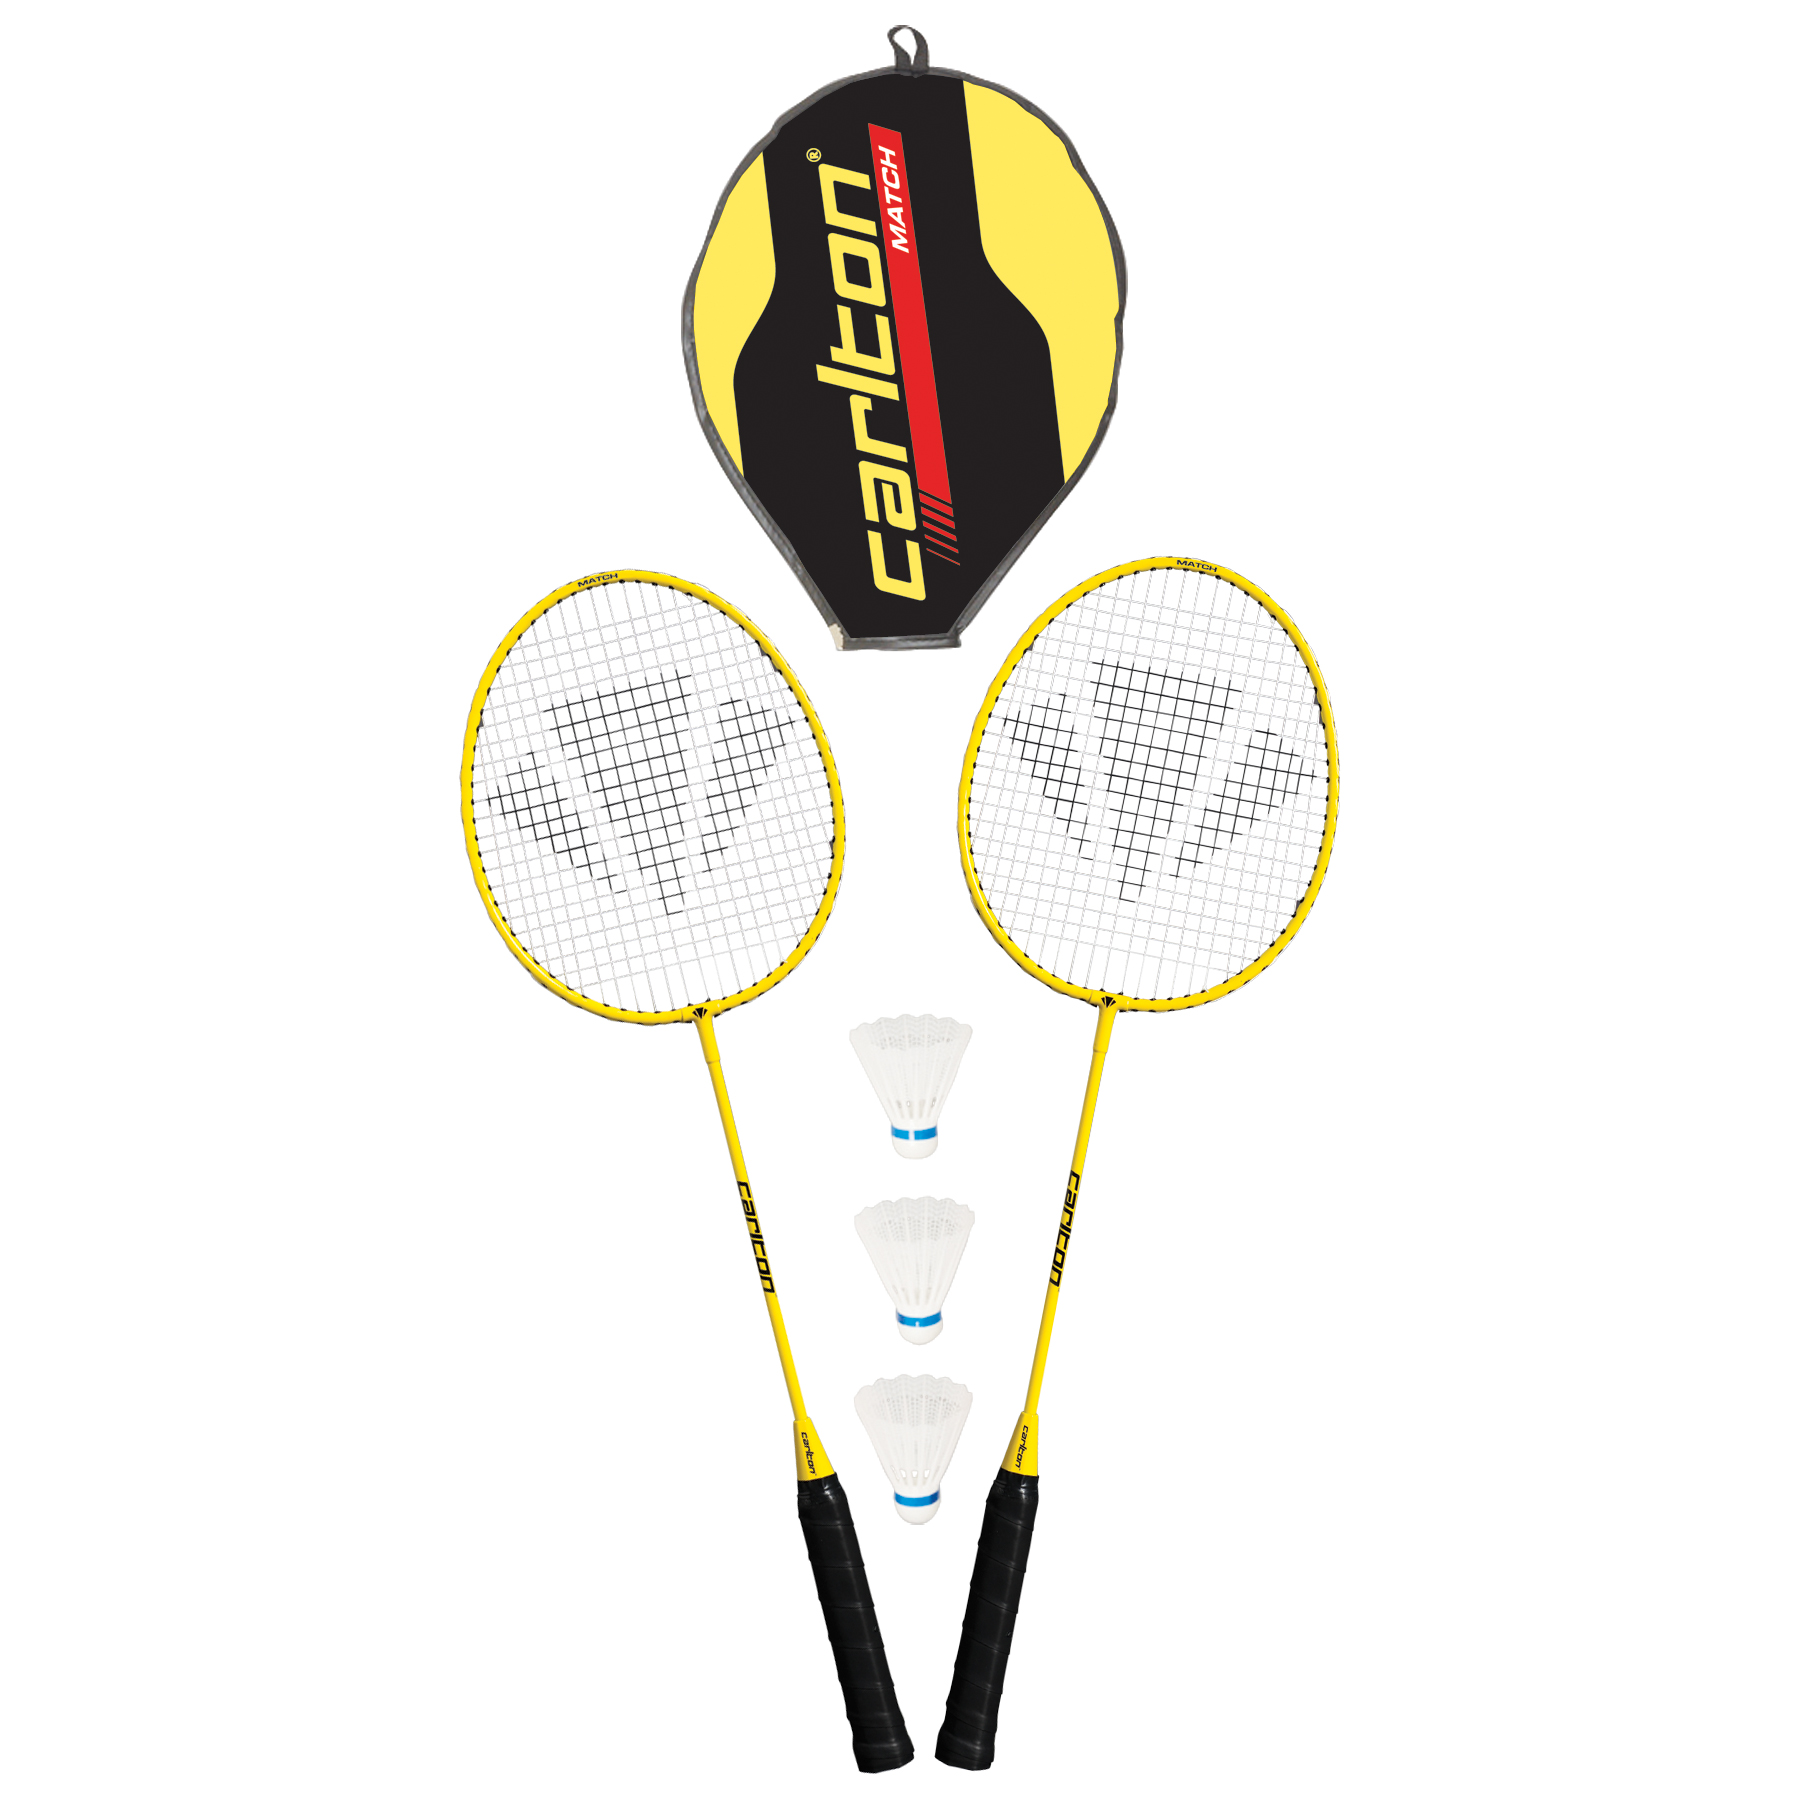 Carlton Badminton Set Net Instructions Badminton Shop Badminton